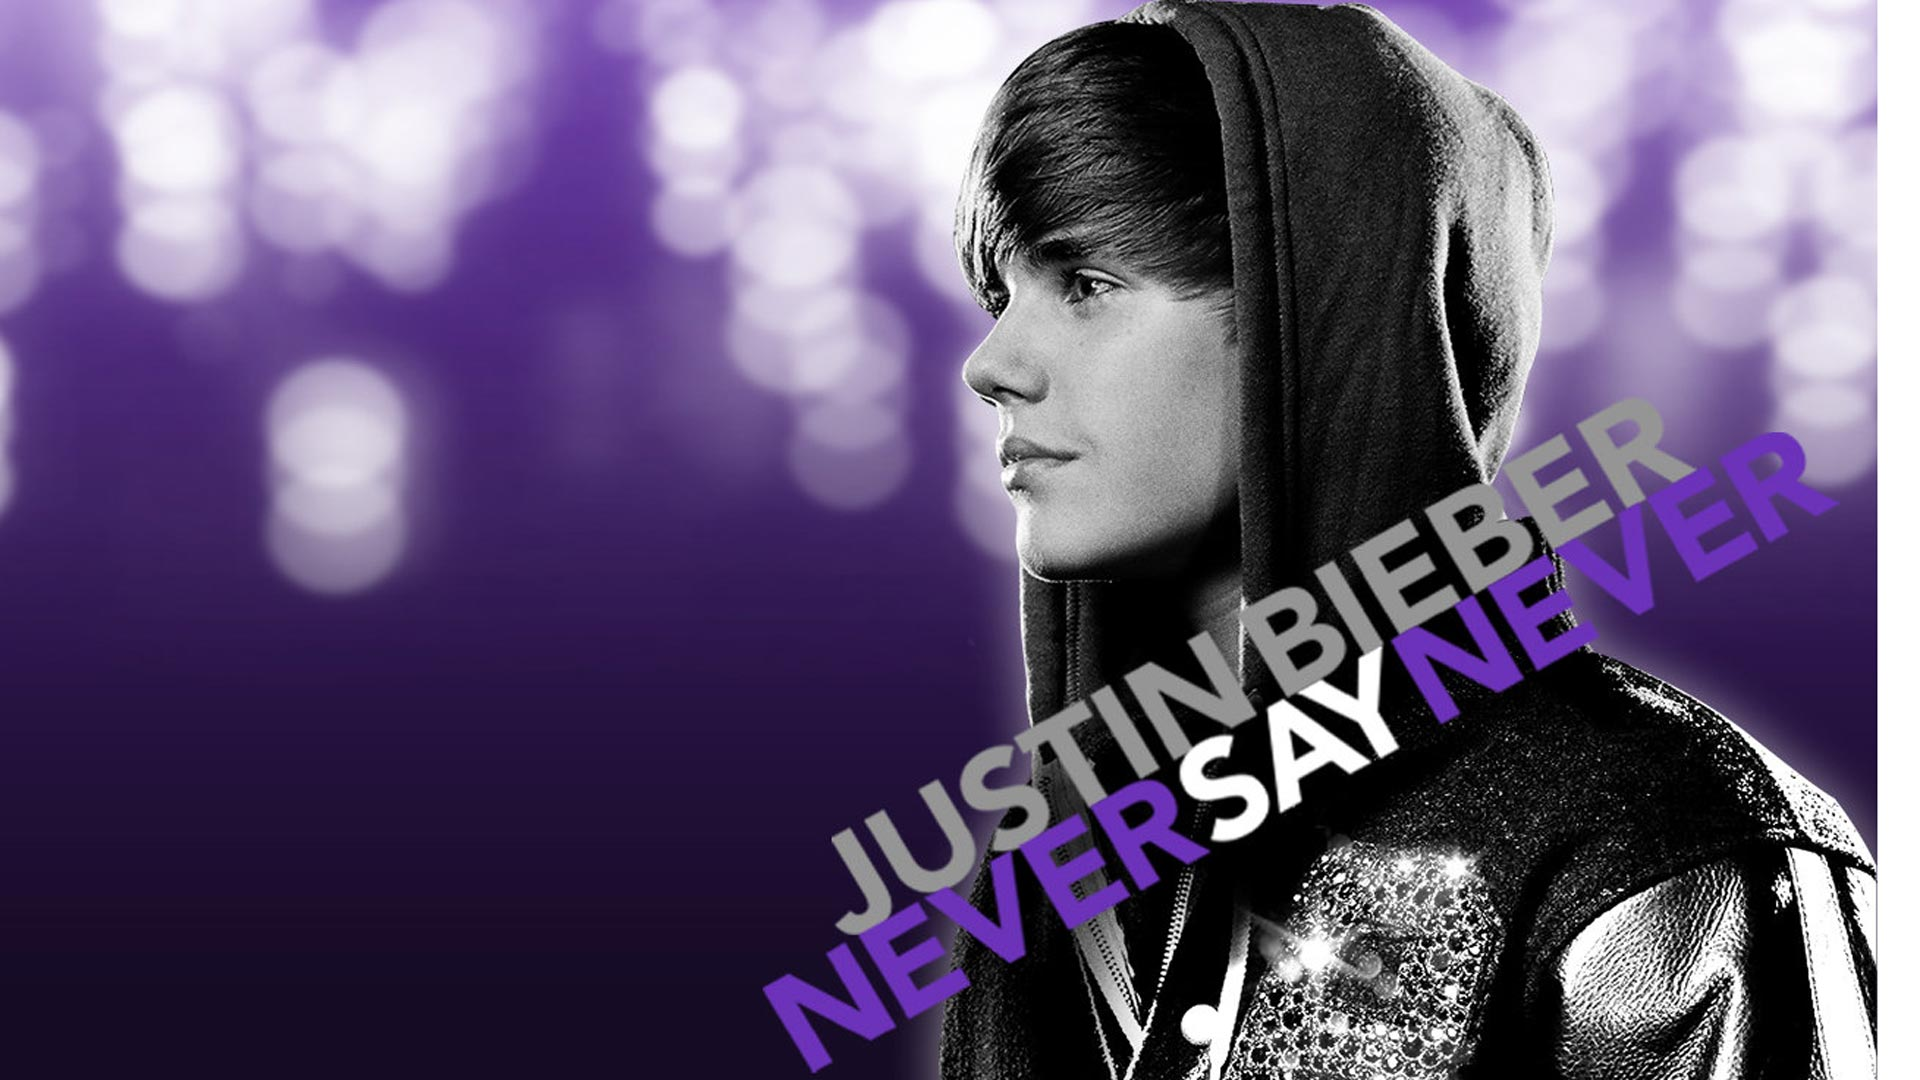 Justin Bieber 2013 Cool Wallpaper: Download Cool HD Wallpapers Here